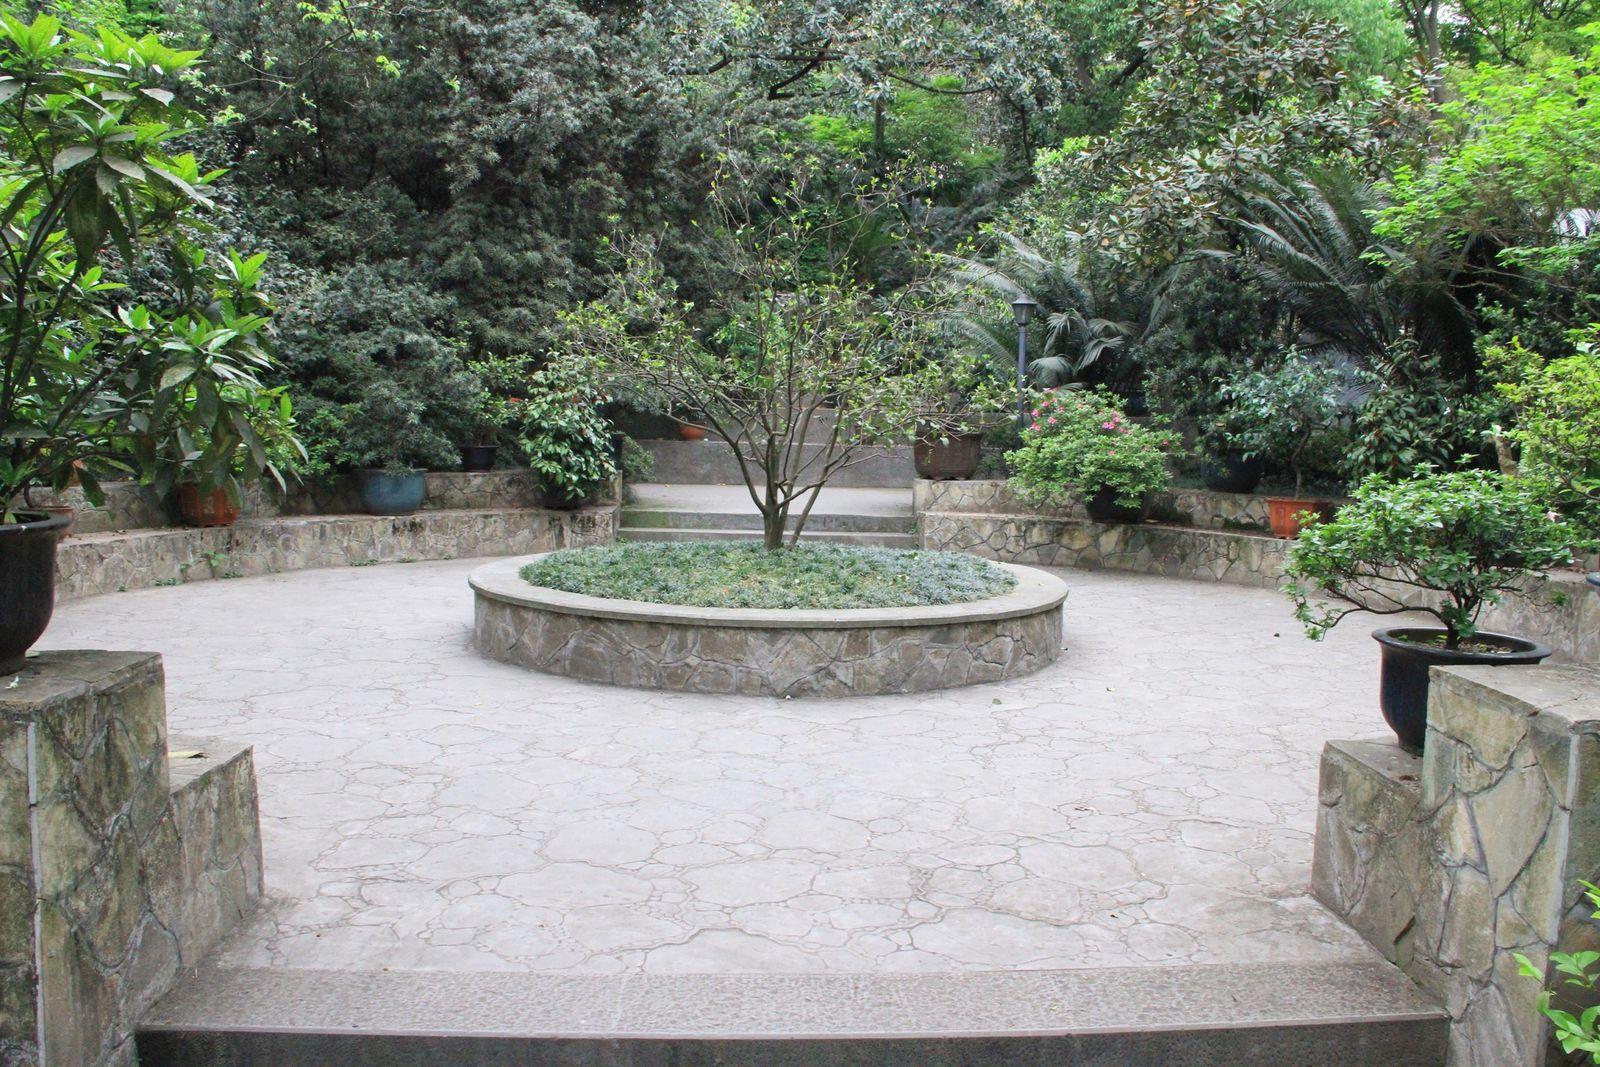 Dans les parcs de chongqing  : eling gongyuan (鹅领公园)